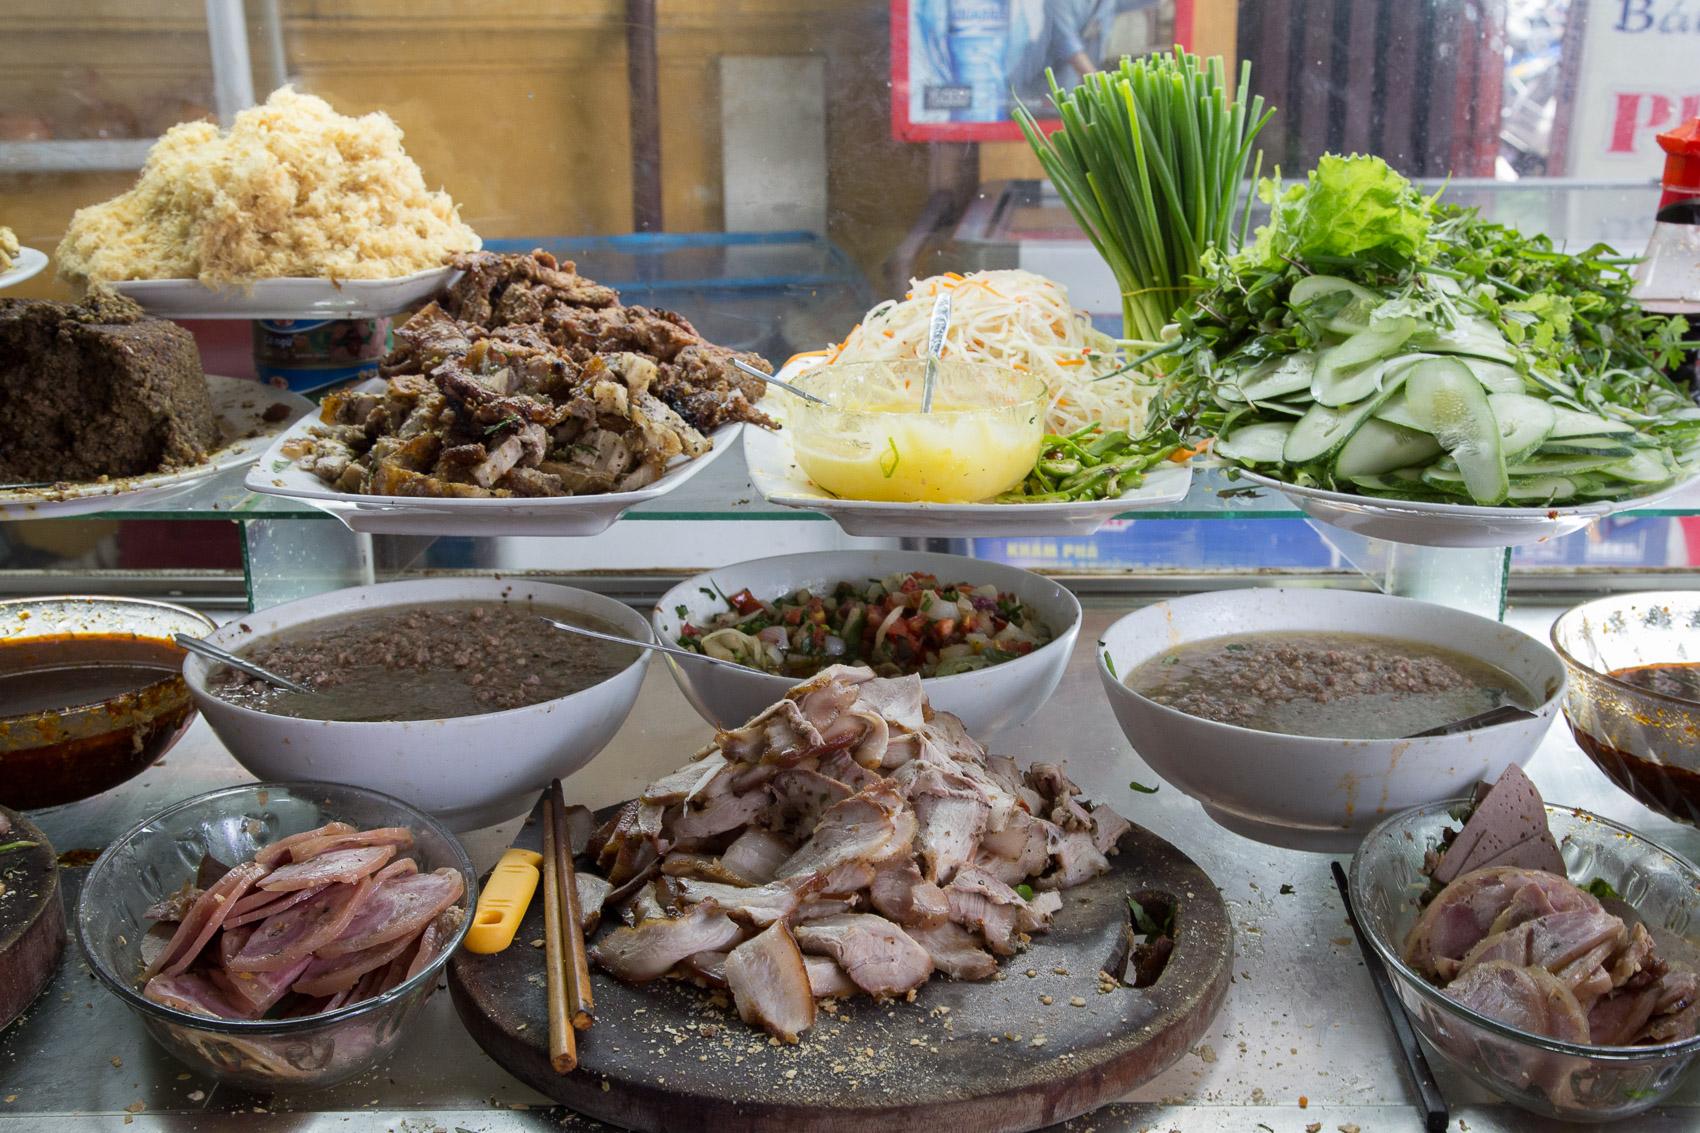 Banh mi ingredients at Madam Phuong's business.